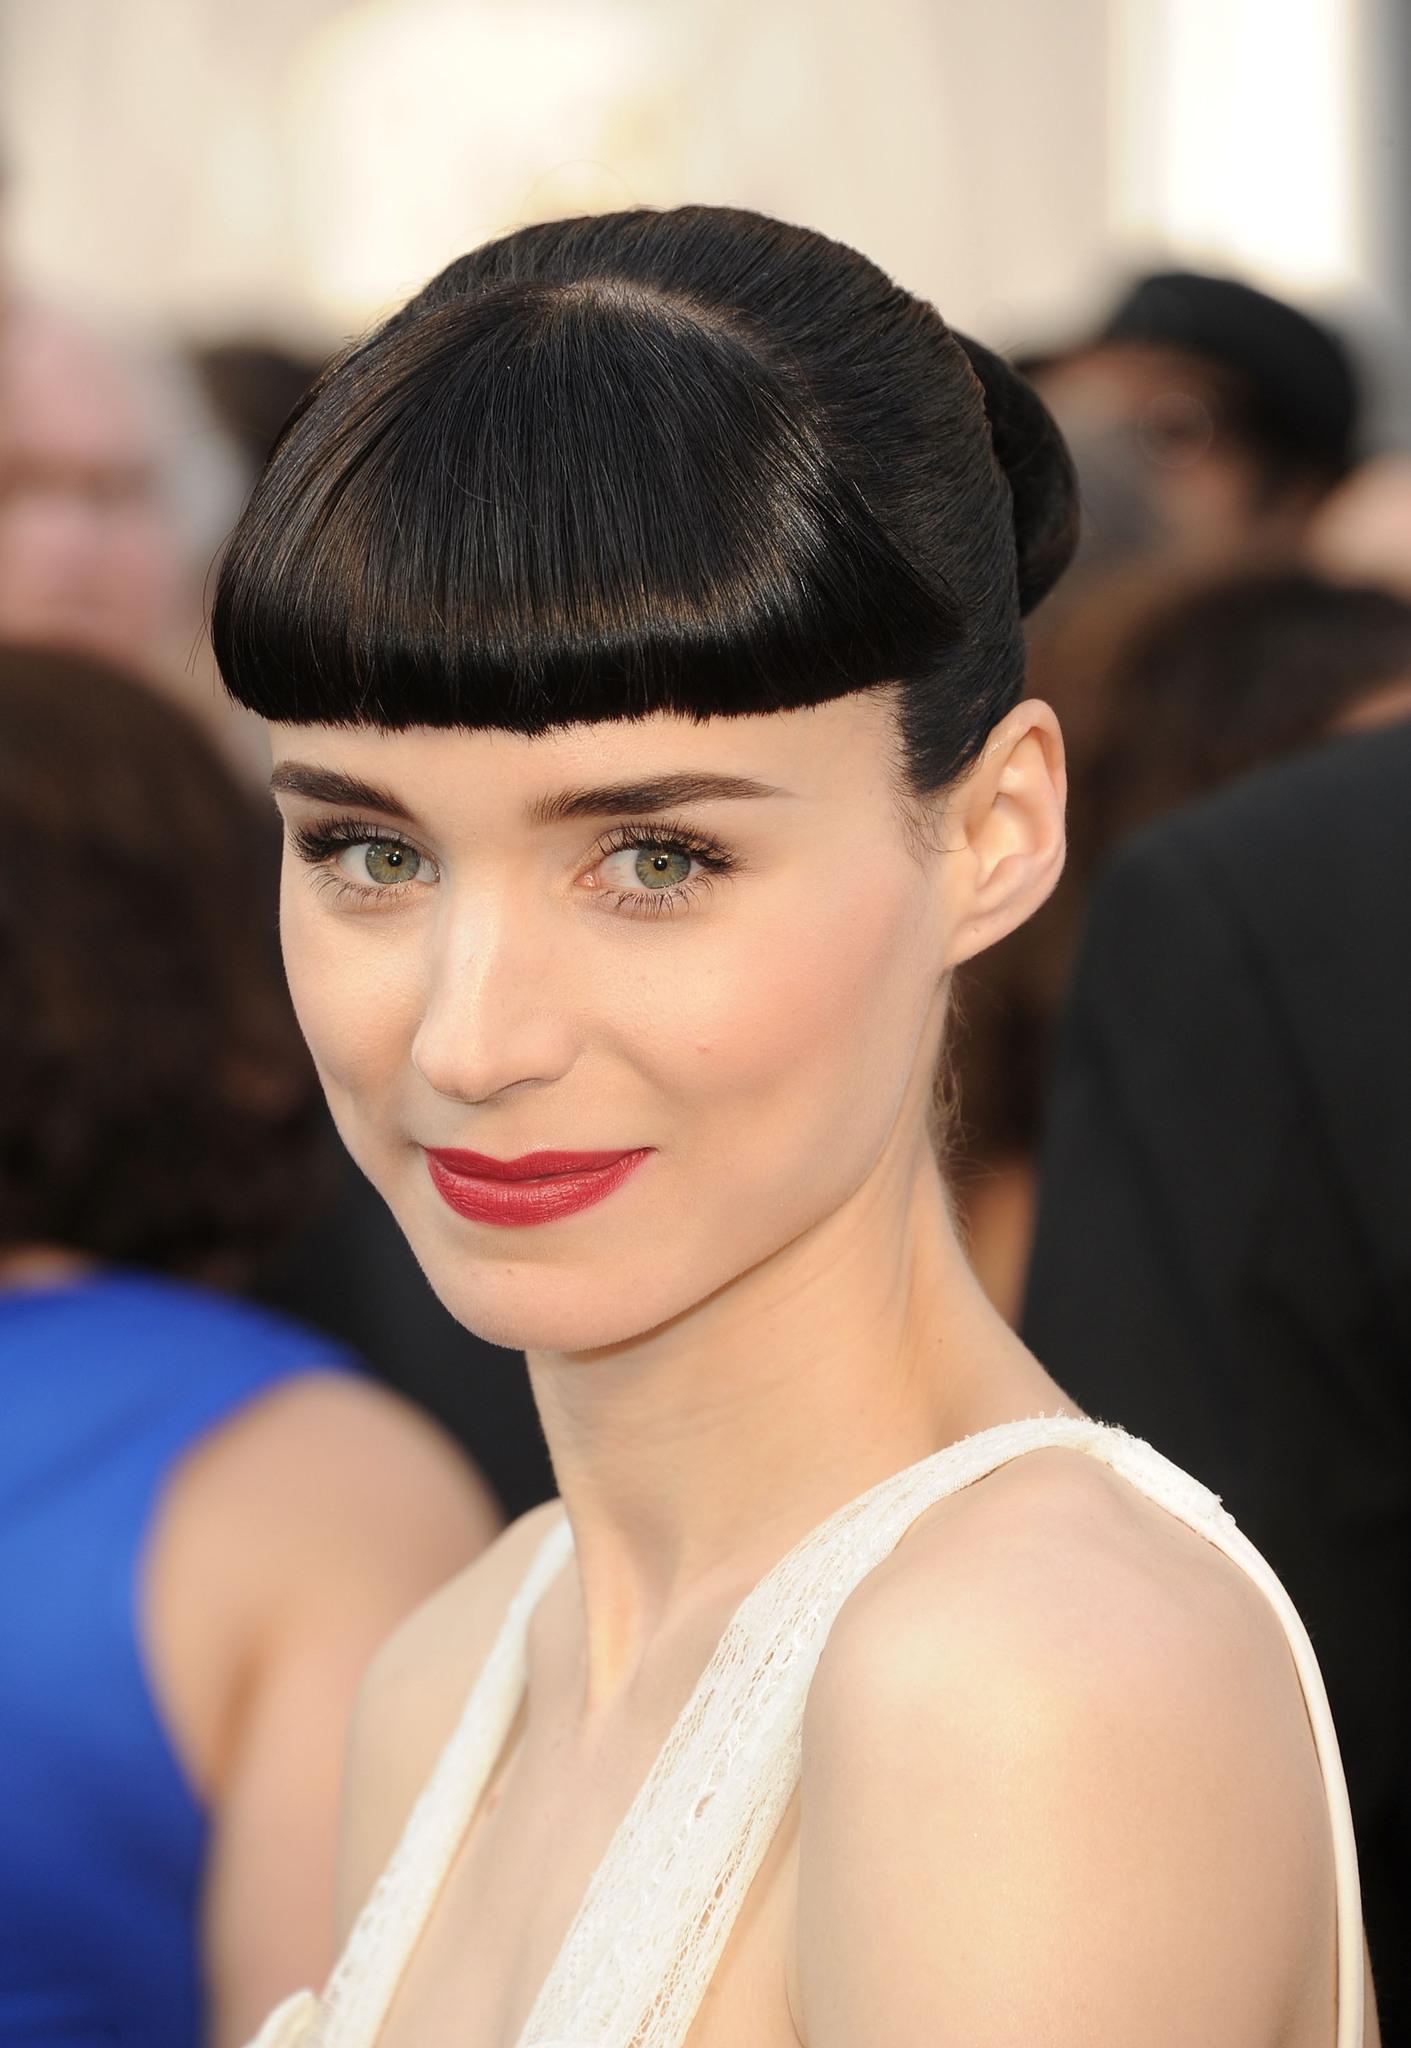 Rooney Mara - IMDb